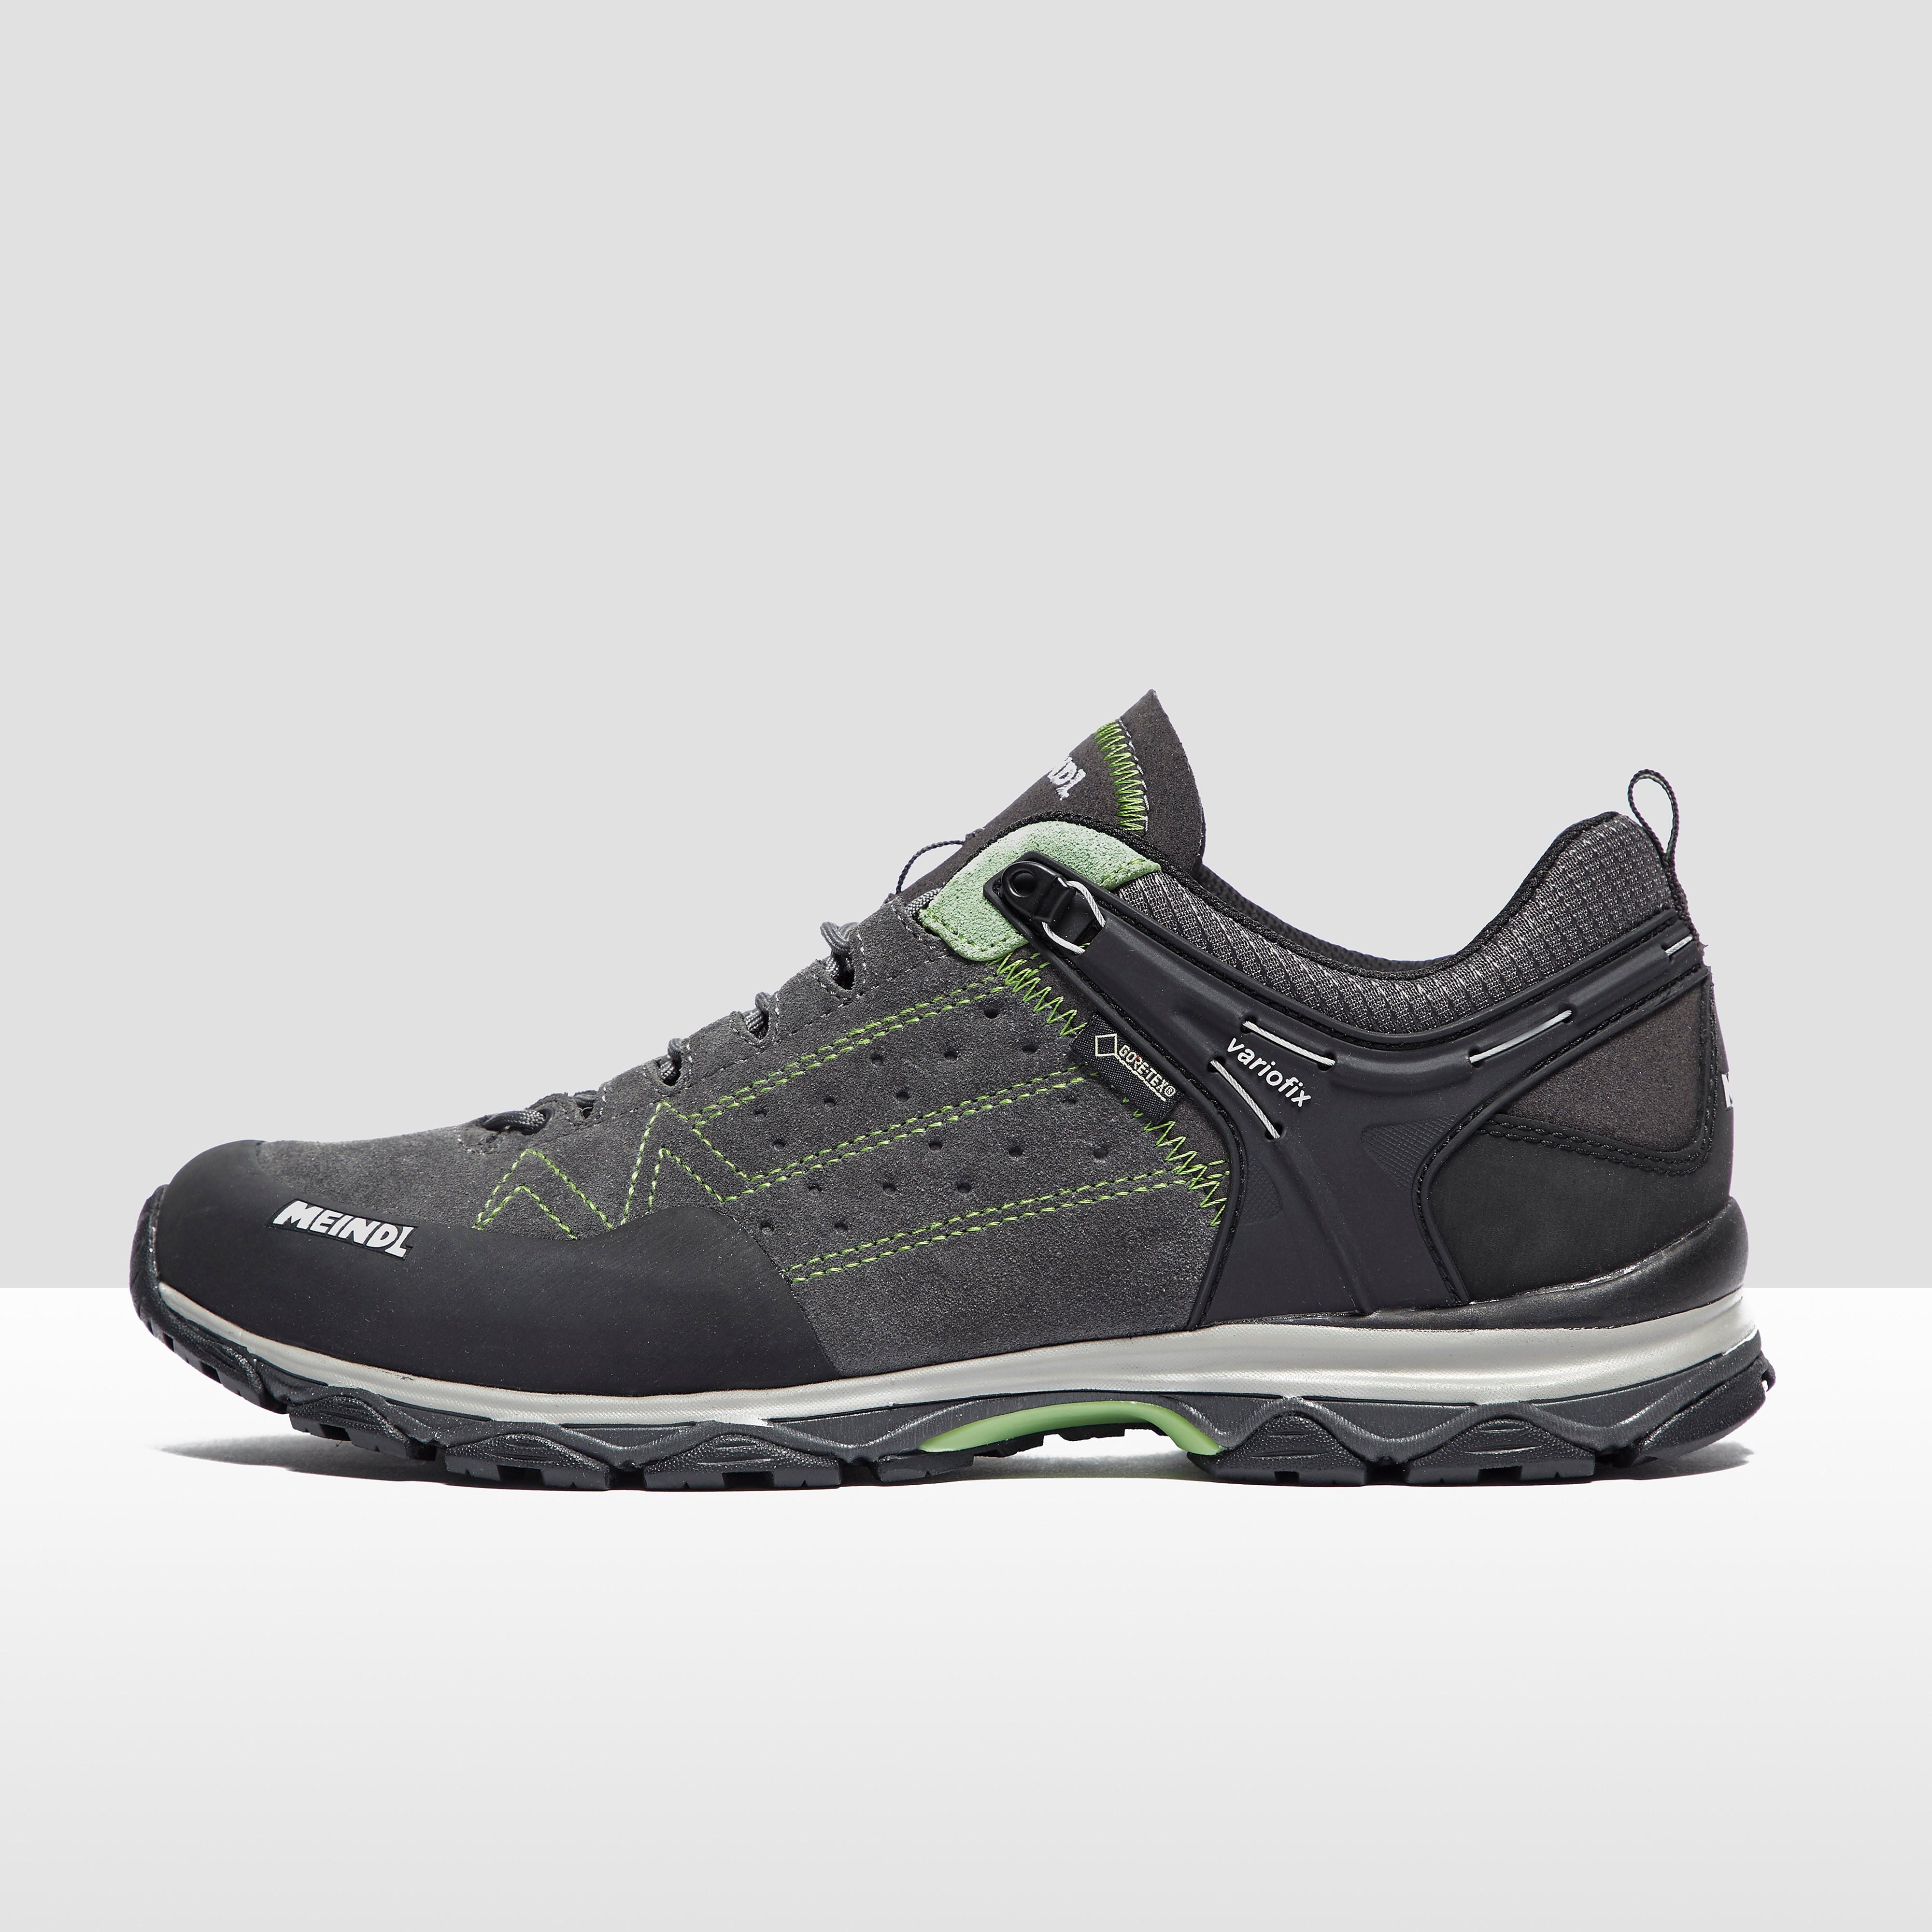 Meindl Ontario Gore-Tex Men's Hiking Shoes